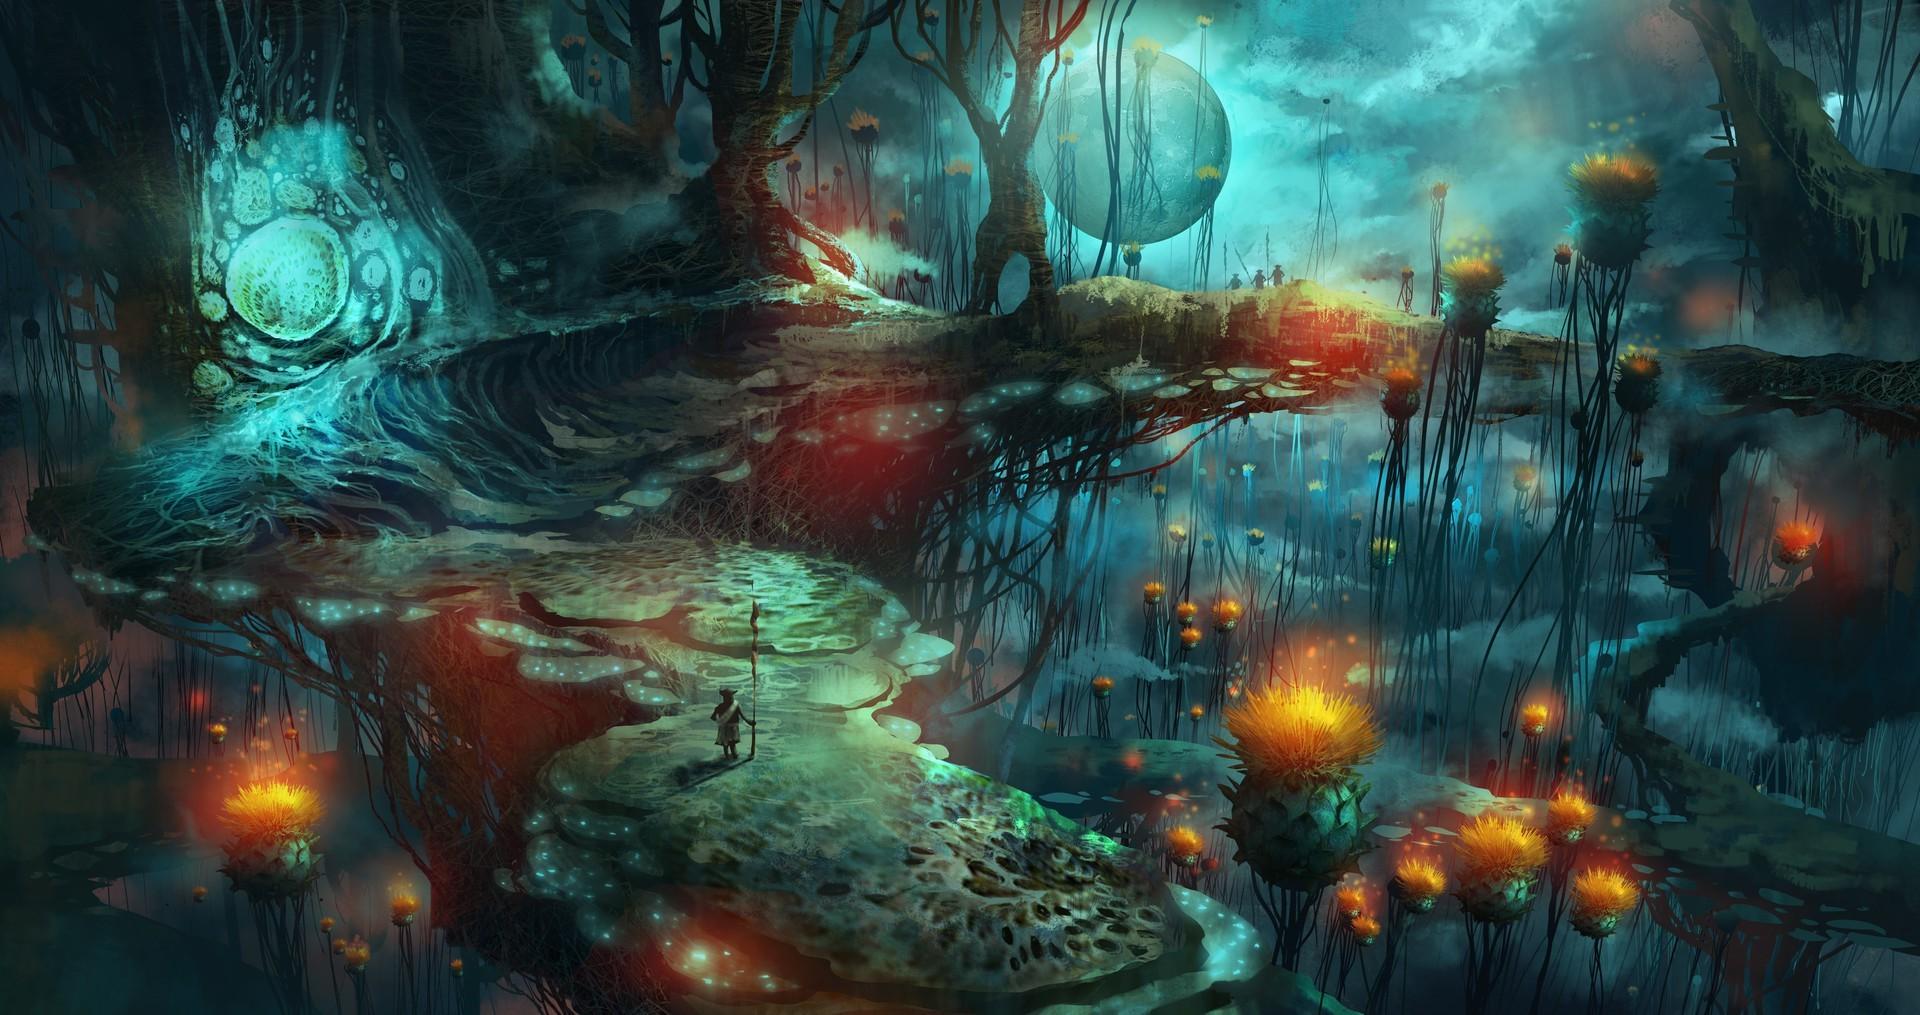 Digital Blasphemy 3d Wallpaper Free Wallpaper Fantasy Art Mushroom Magic Mushrooms